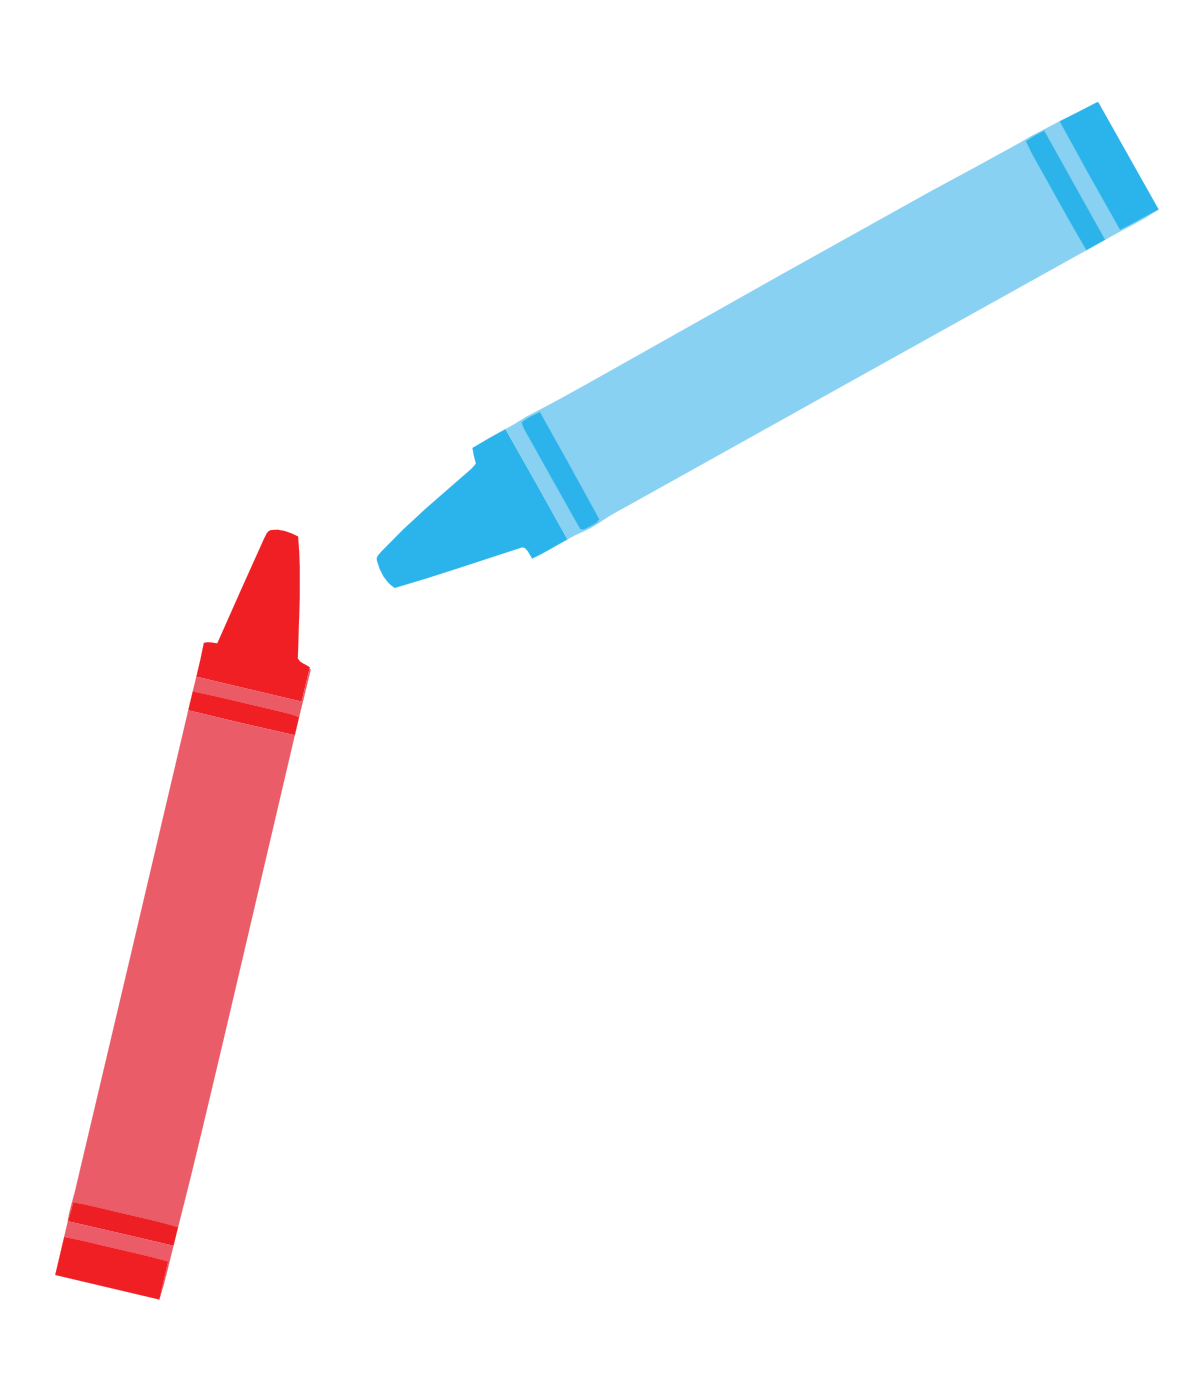 crayons-1